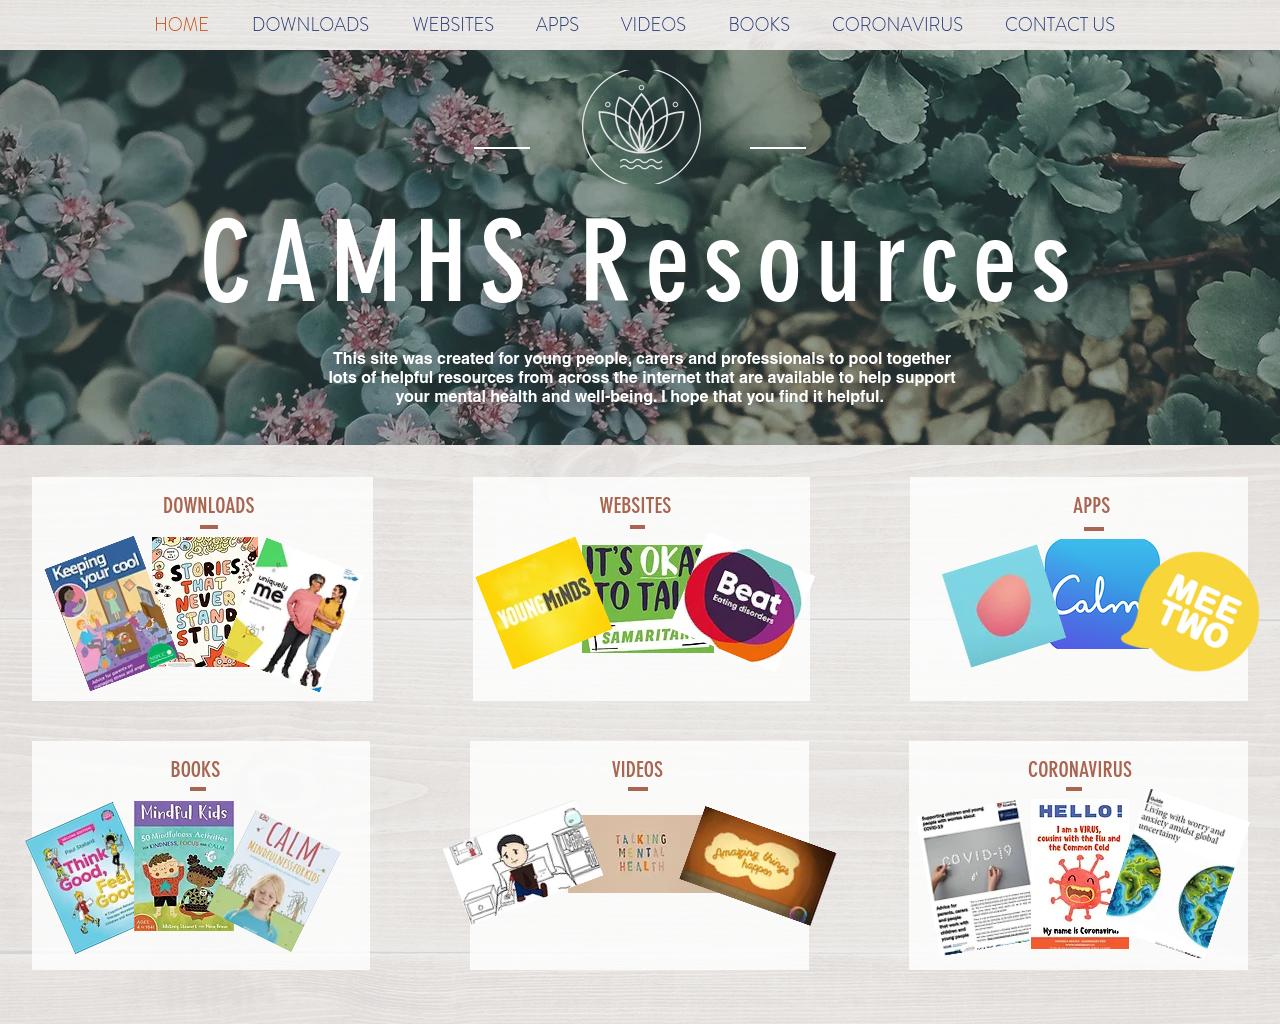 CAHMS Resources